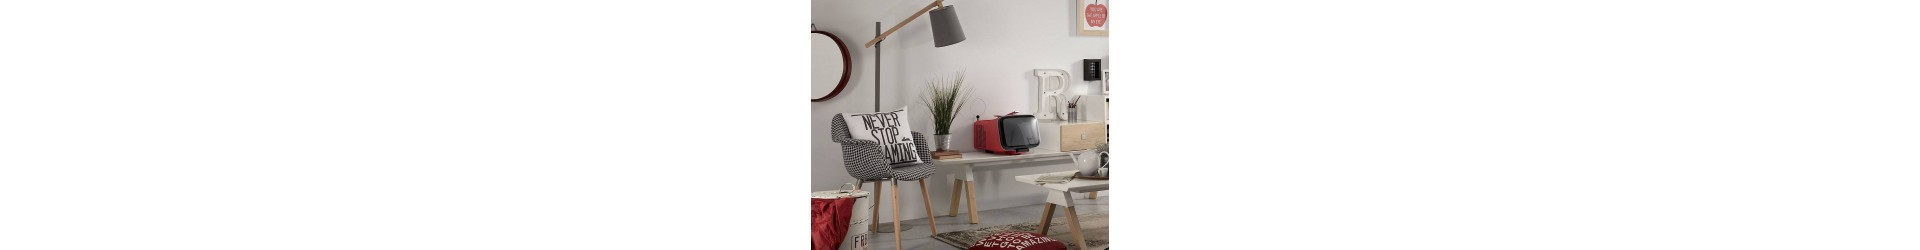 Salas de estar, paredes, bibliotecas, módulos.